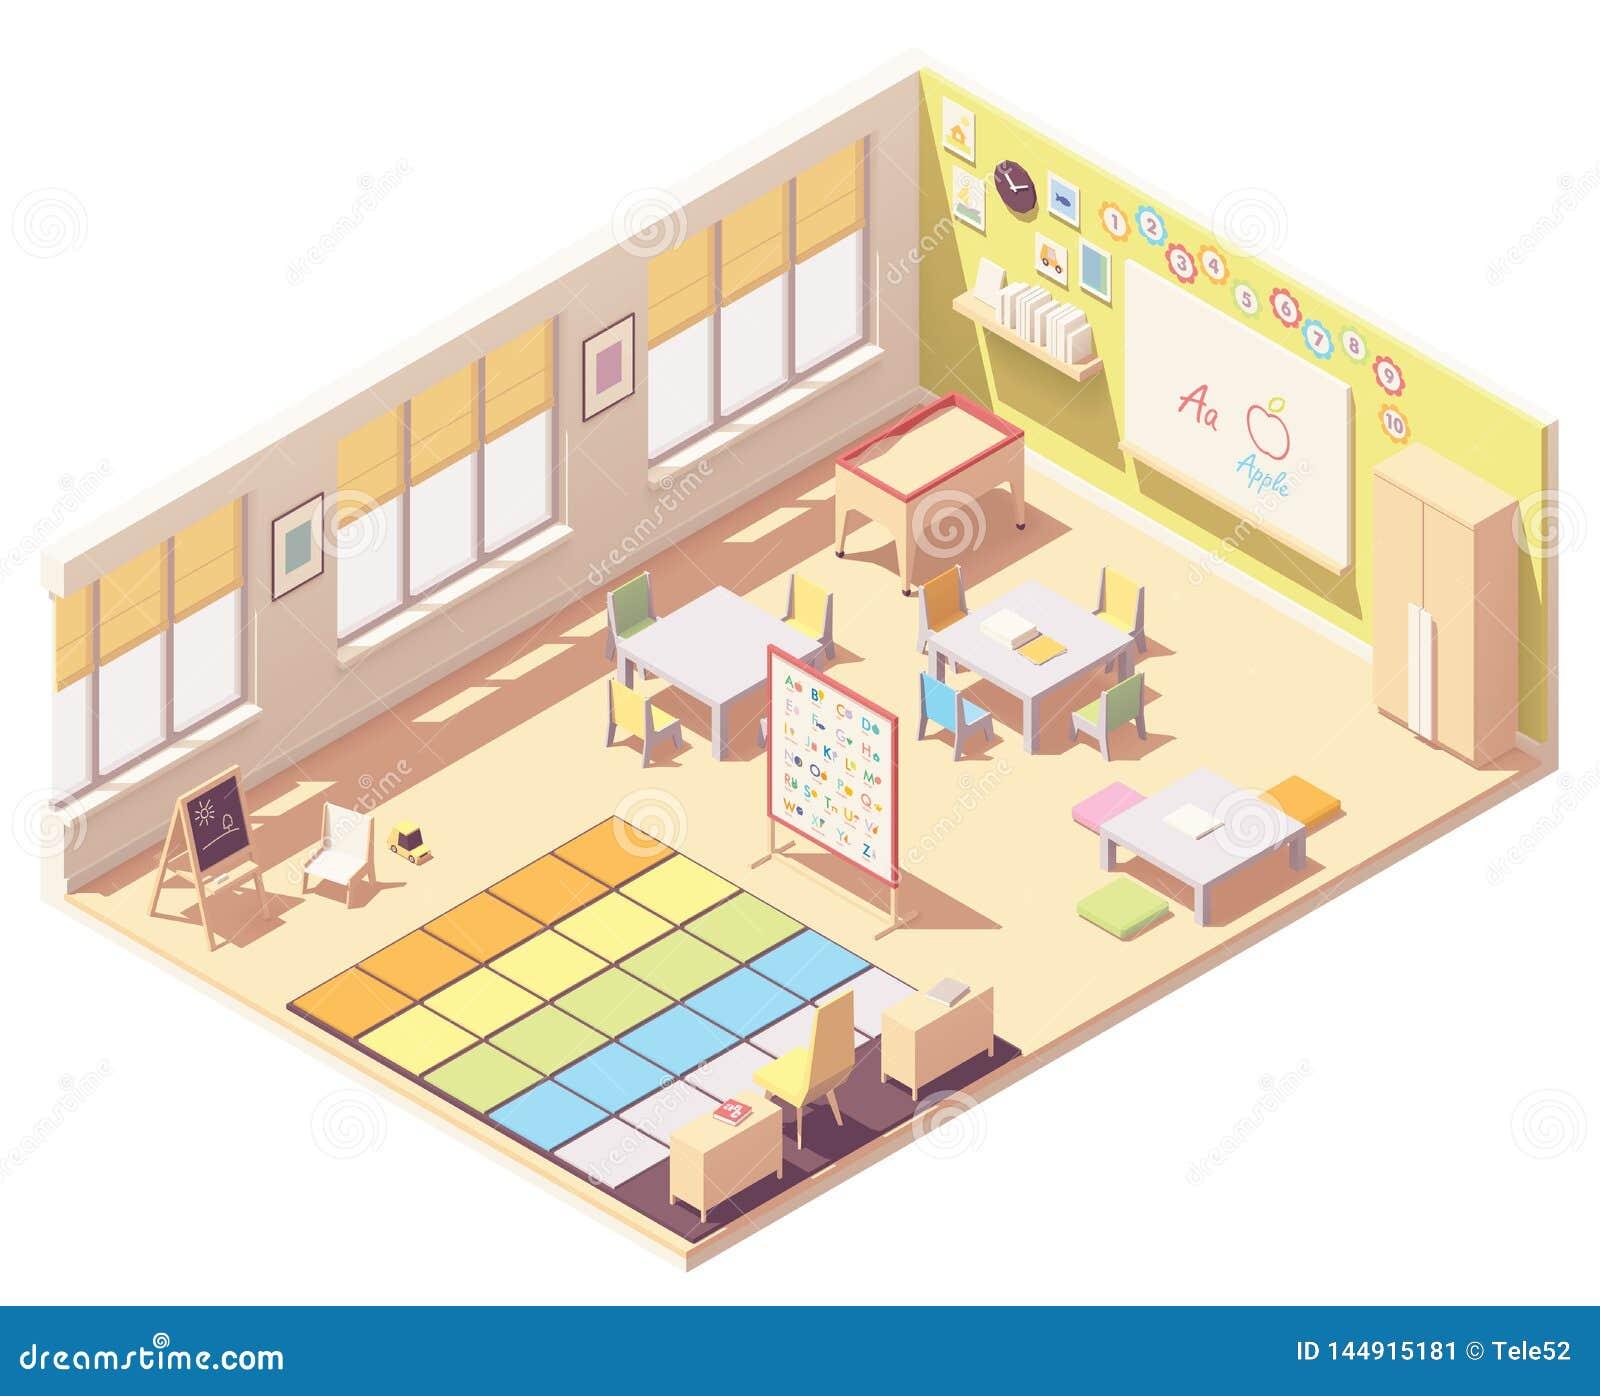 Vector Kindergarten Classroom Stock Vector Illustration Of Class Classroom 144915181